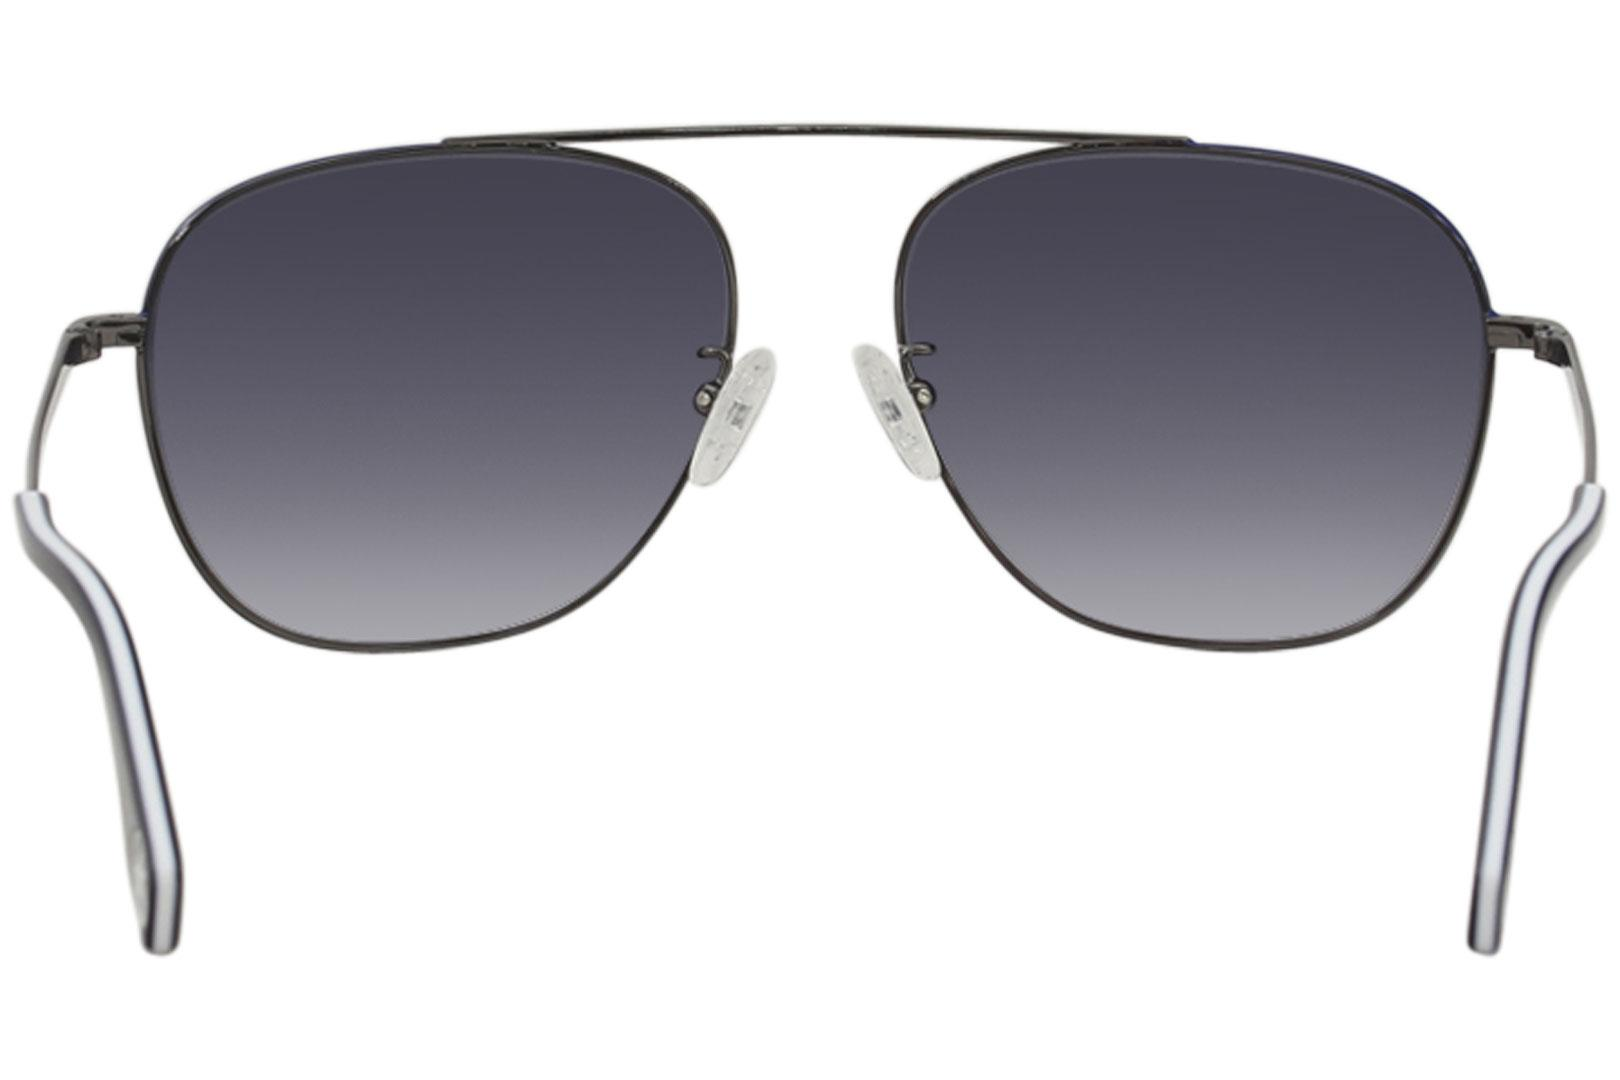 67b54484f93 Converse Men s SCO056 SCO 056 Fashion Pilot Sunglasses by Converse. Touch  to zoom